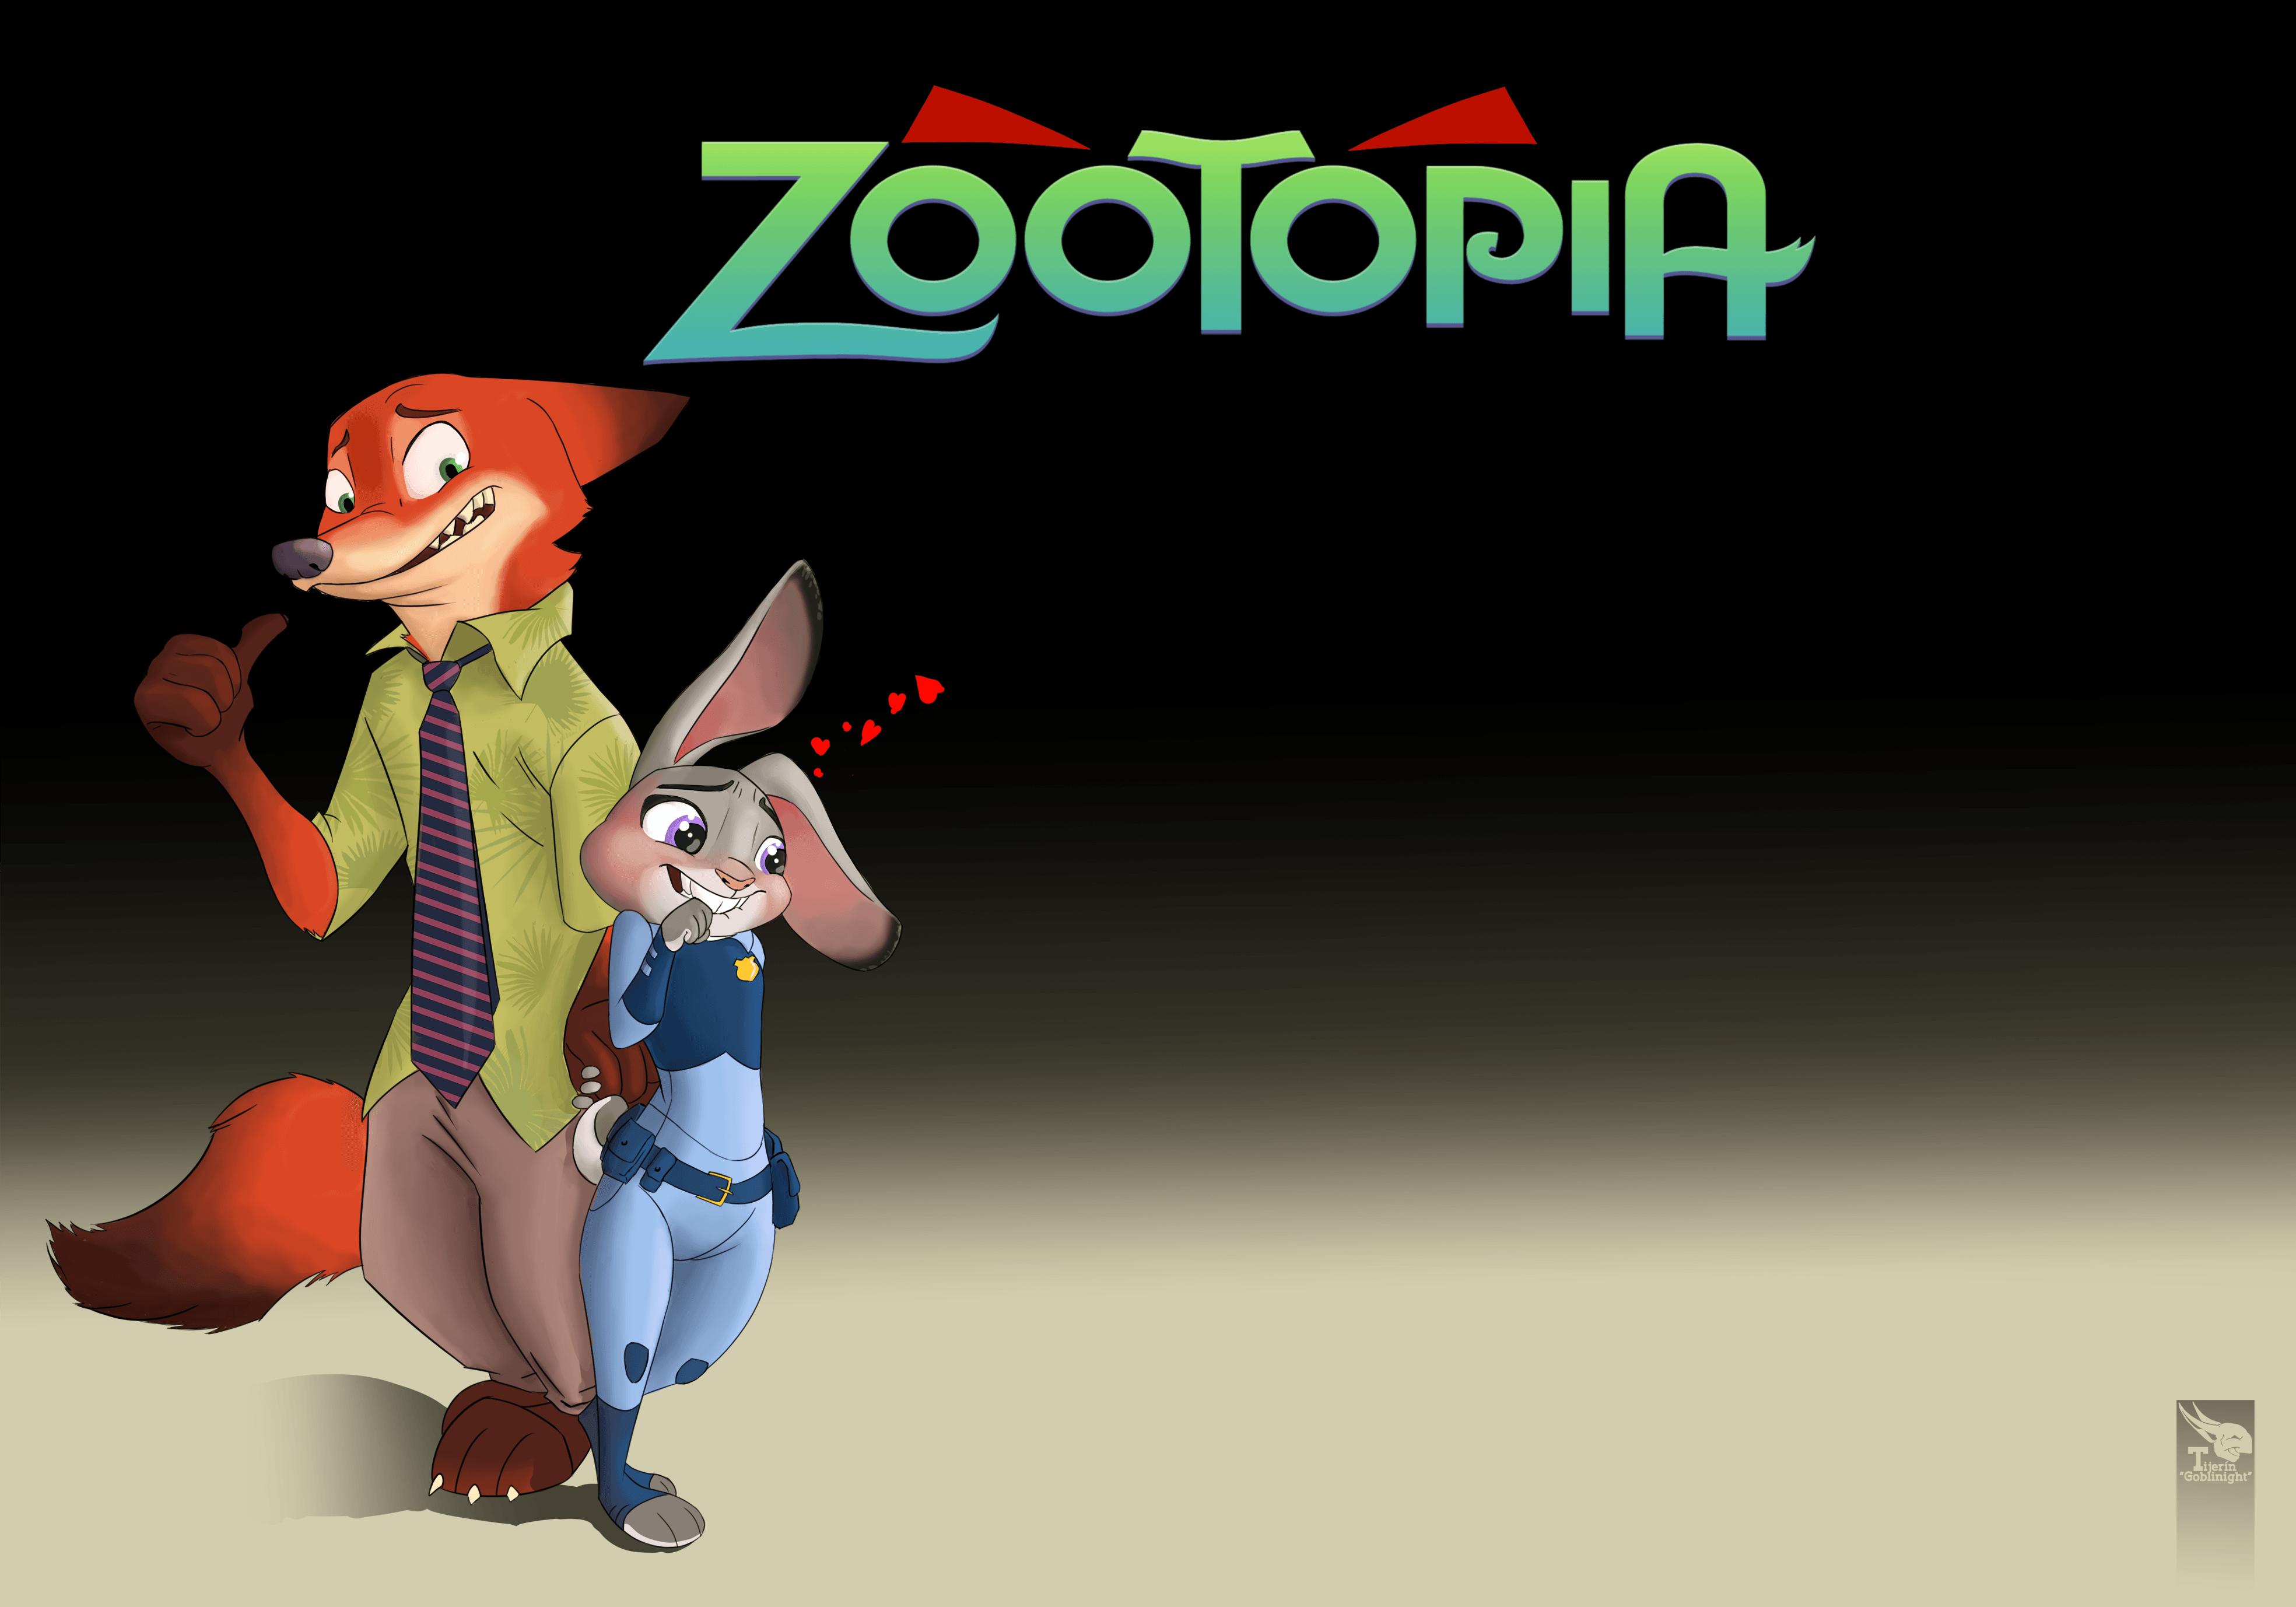 Zootopia HD Wallpapers - Wallpaper Cave